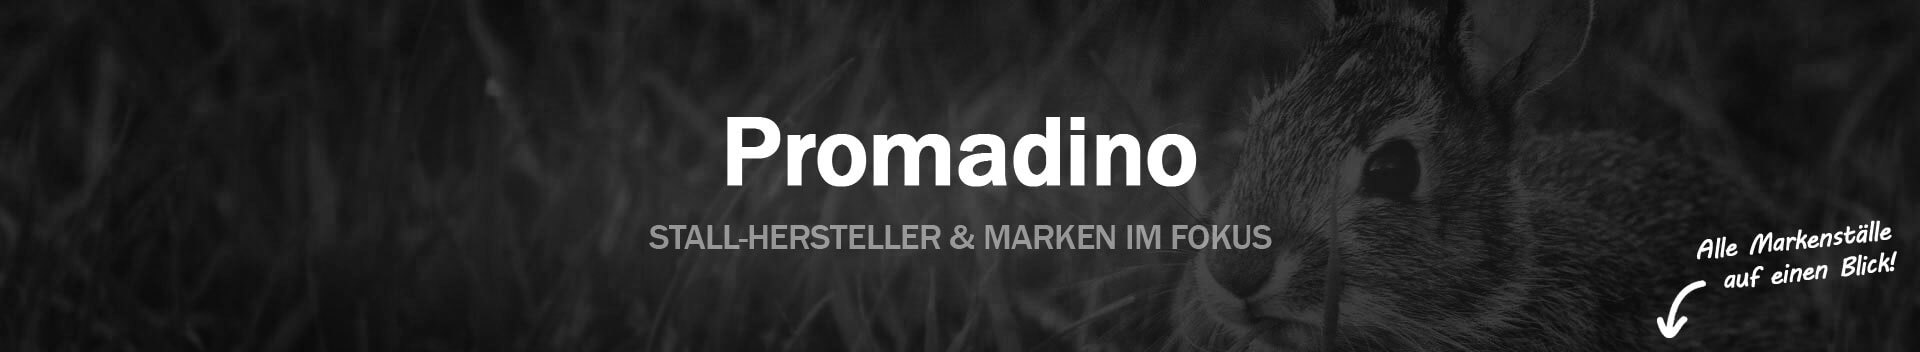 promadino-kaninchenstall-hersteller